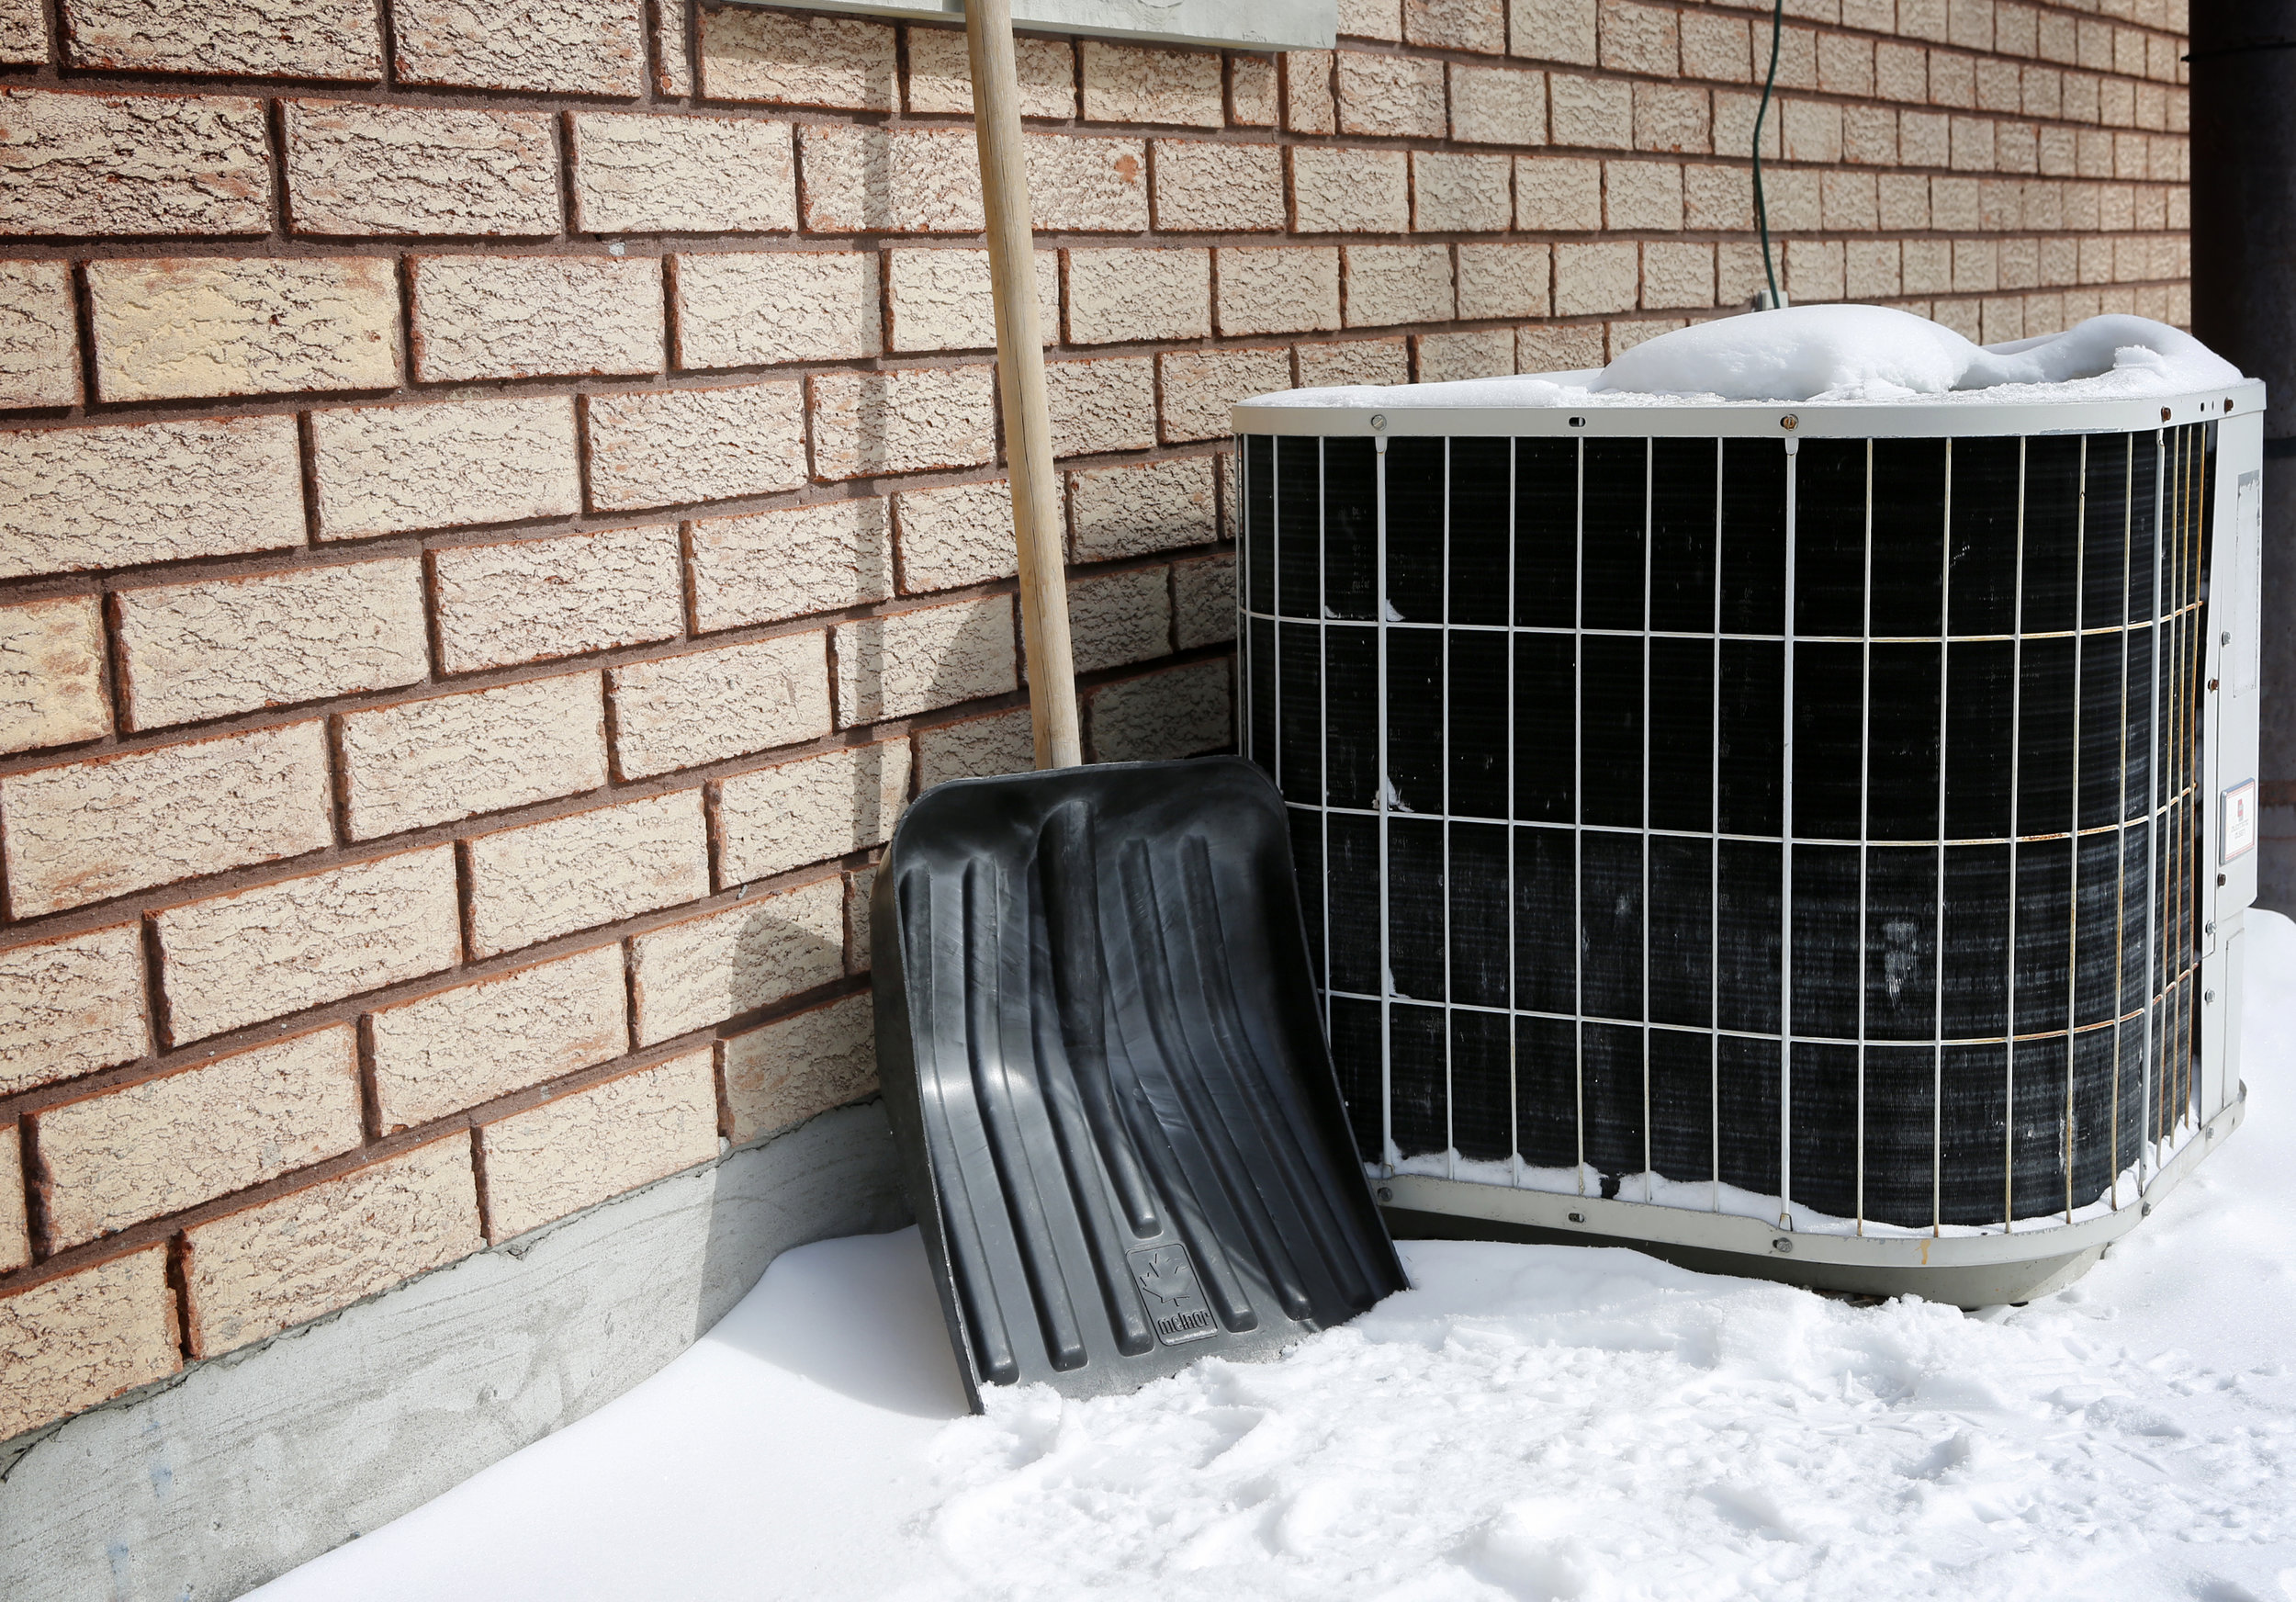 AC Repairs in Winter_iStock-465649828.jpg